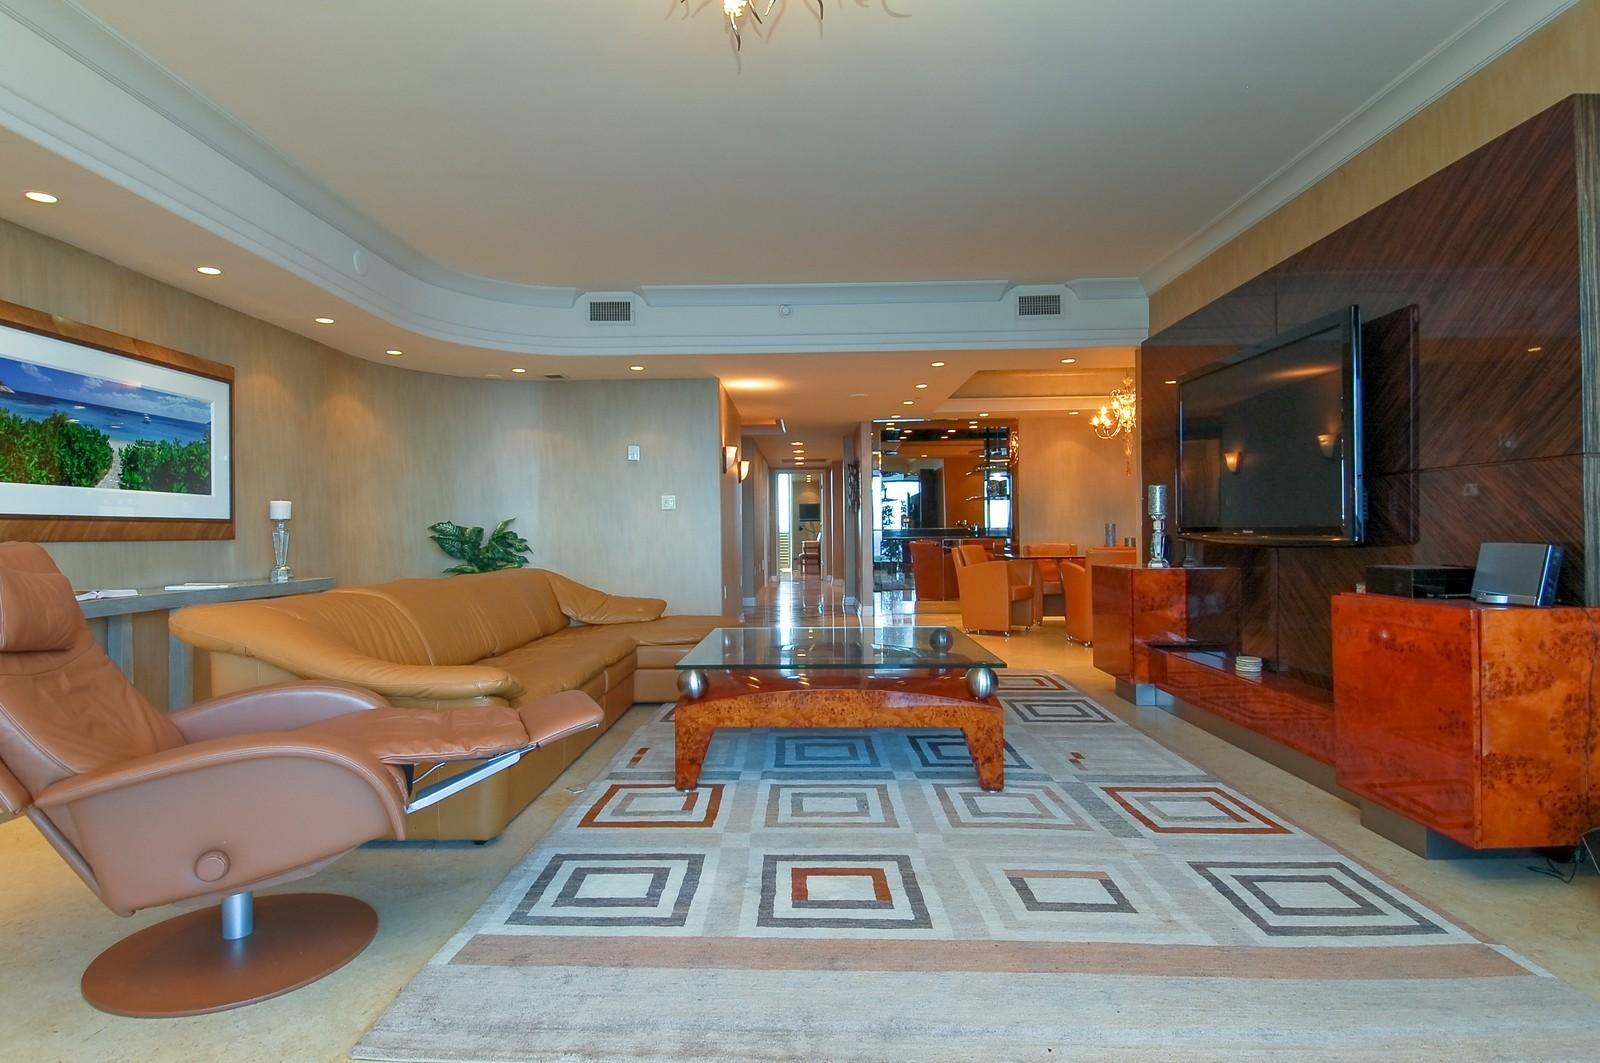 Real Estate Photography - 1600 S Ocean Blvd, Apt 802, Pompano Beach, FL, 33062 - Family Room / Kitchen